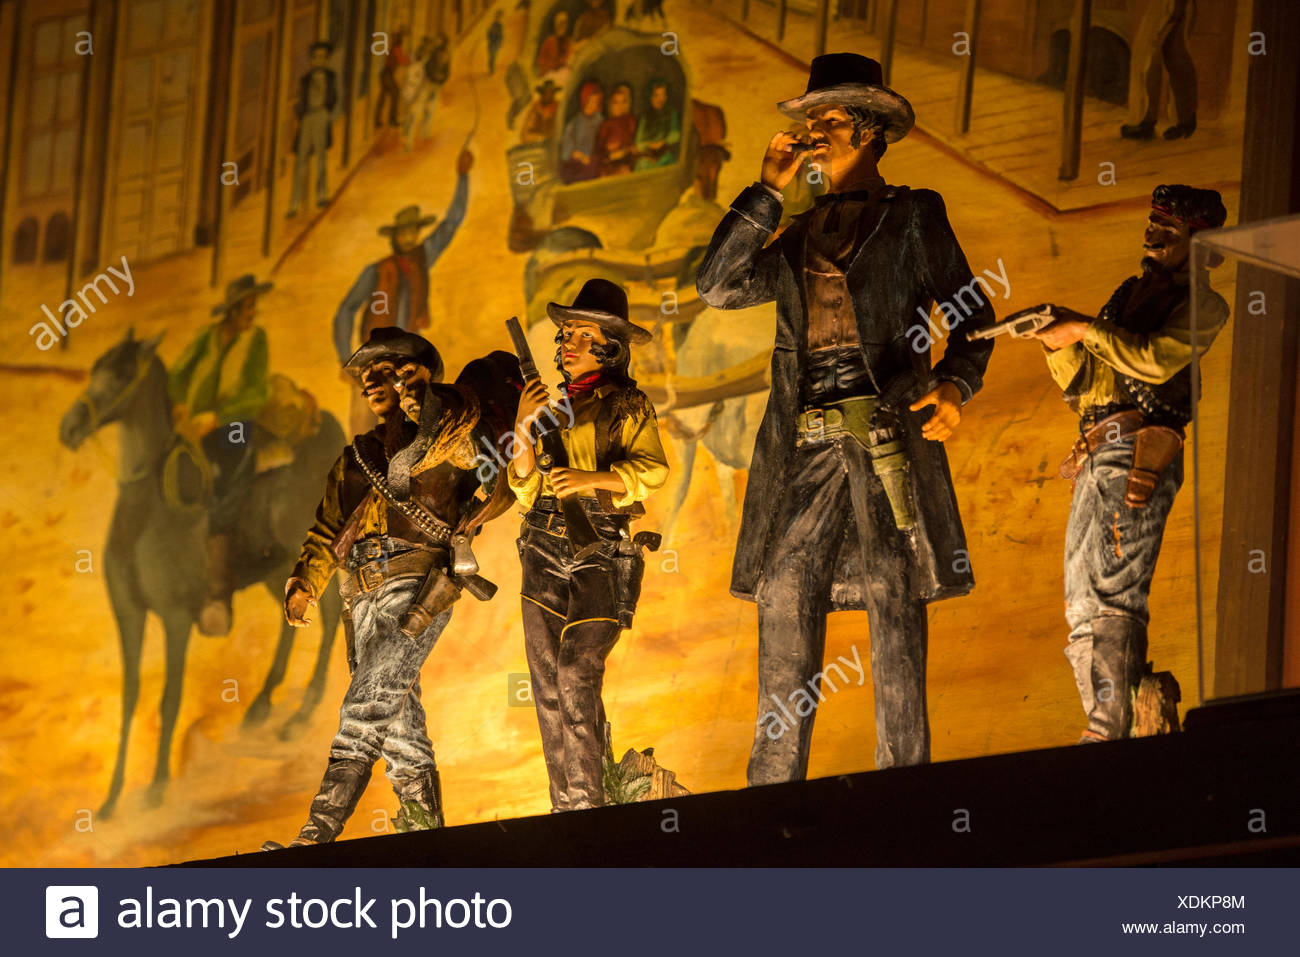 Arizona, Tombstone, figures in saloon - Stock Image